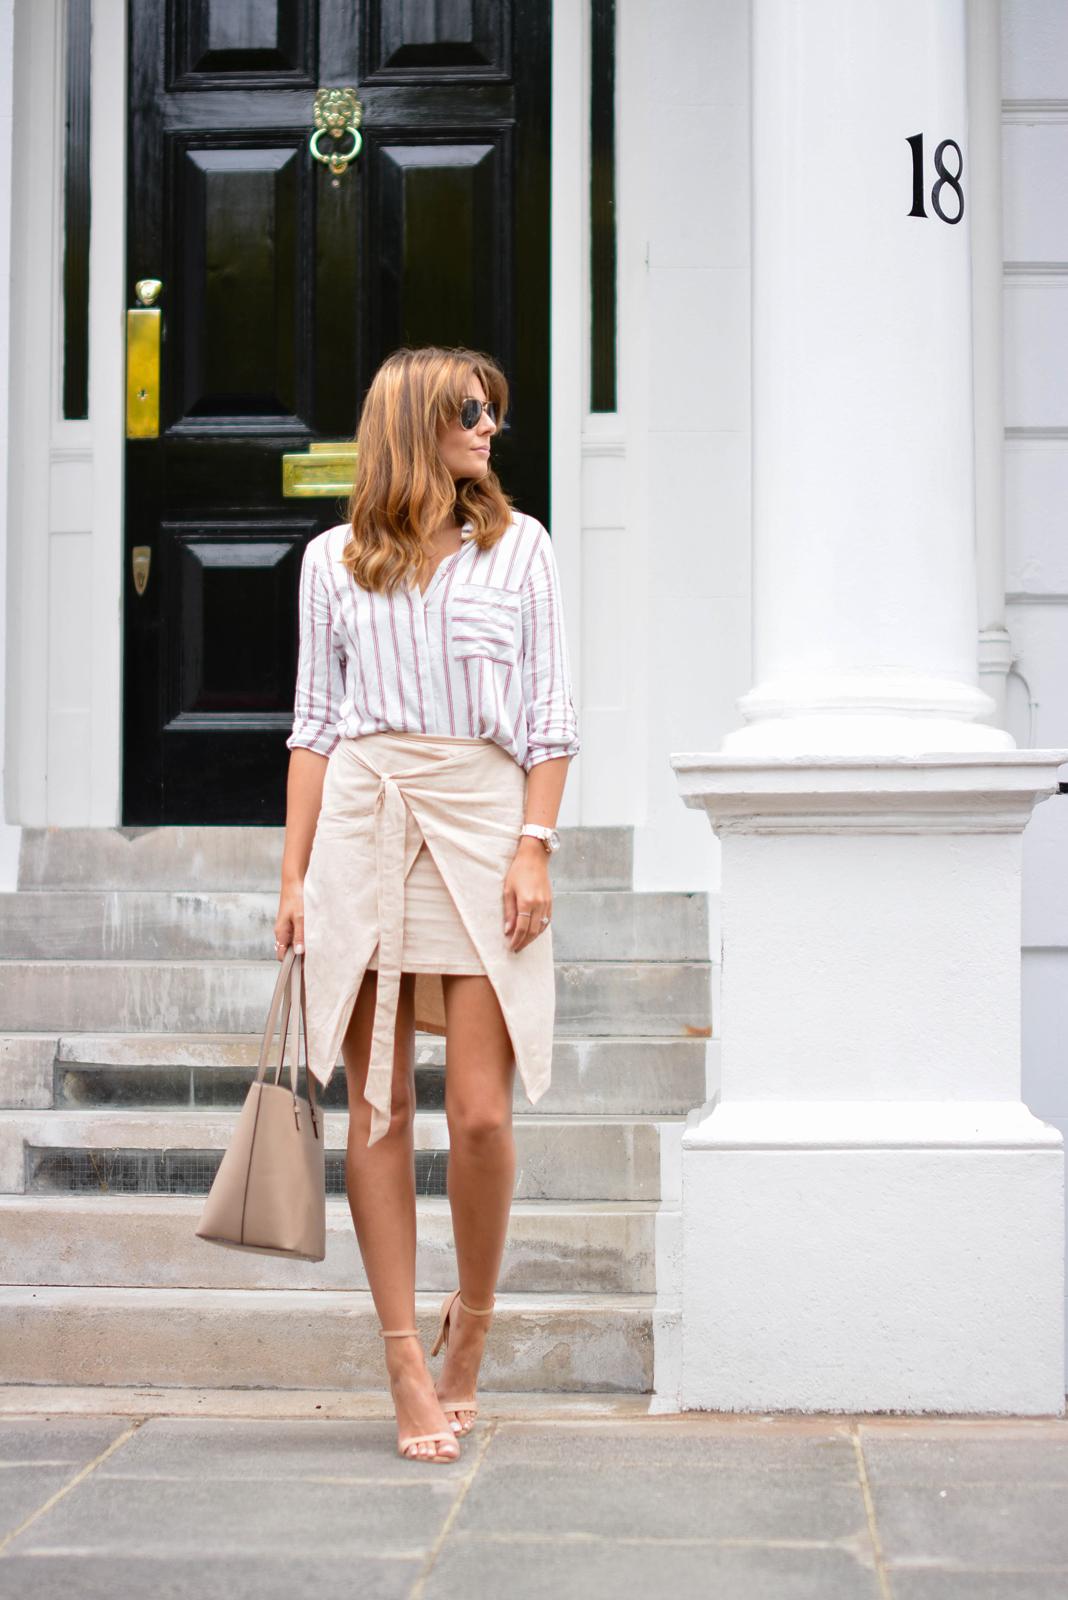 EJSTYLE - Emma Hill wears Zara stripe shirt, beige wrap skirt, nude strappy sandals, Mango saffiano tote bag, aviator sunglasses, Summer OOTD, street style 2015